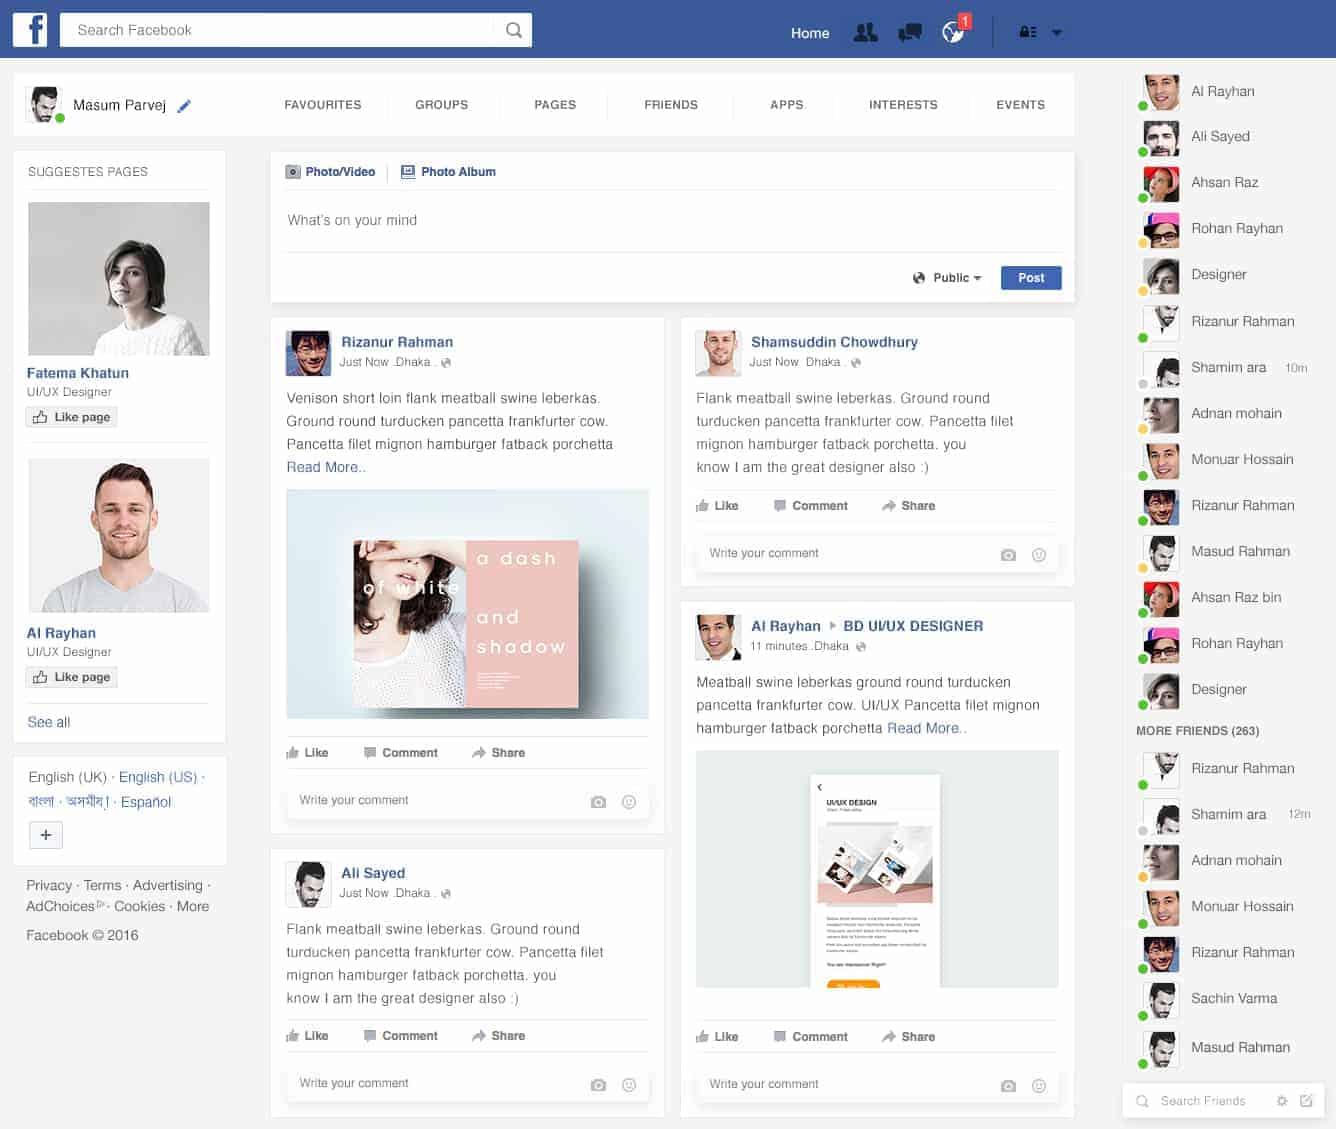 Facebook Home Page Redesign - Design Ideas